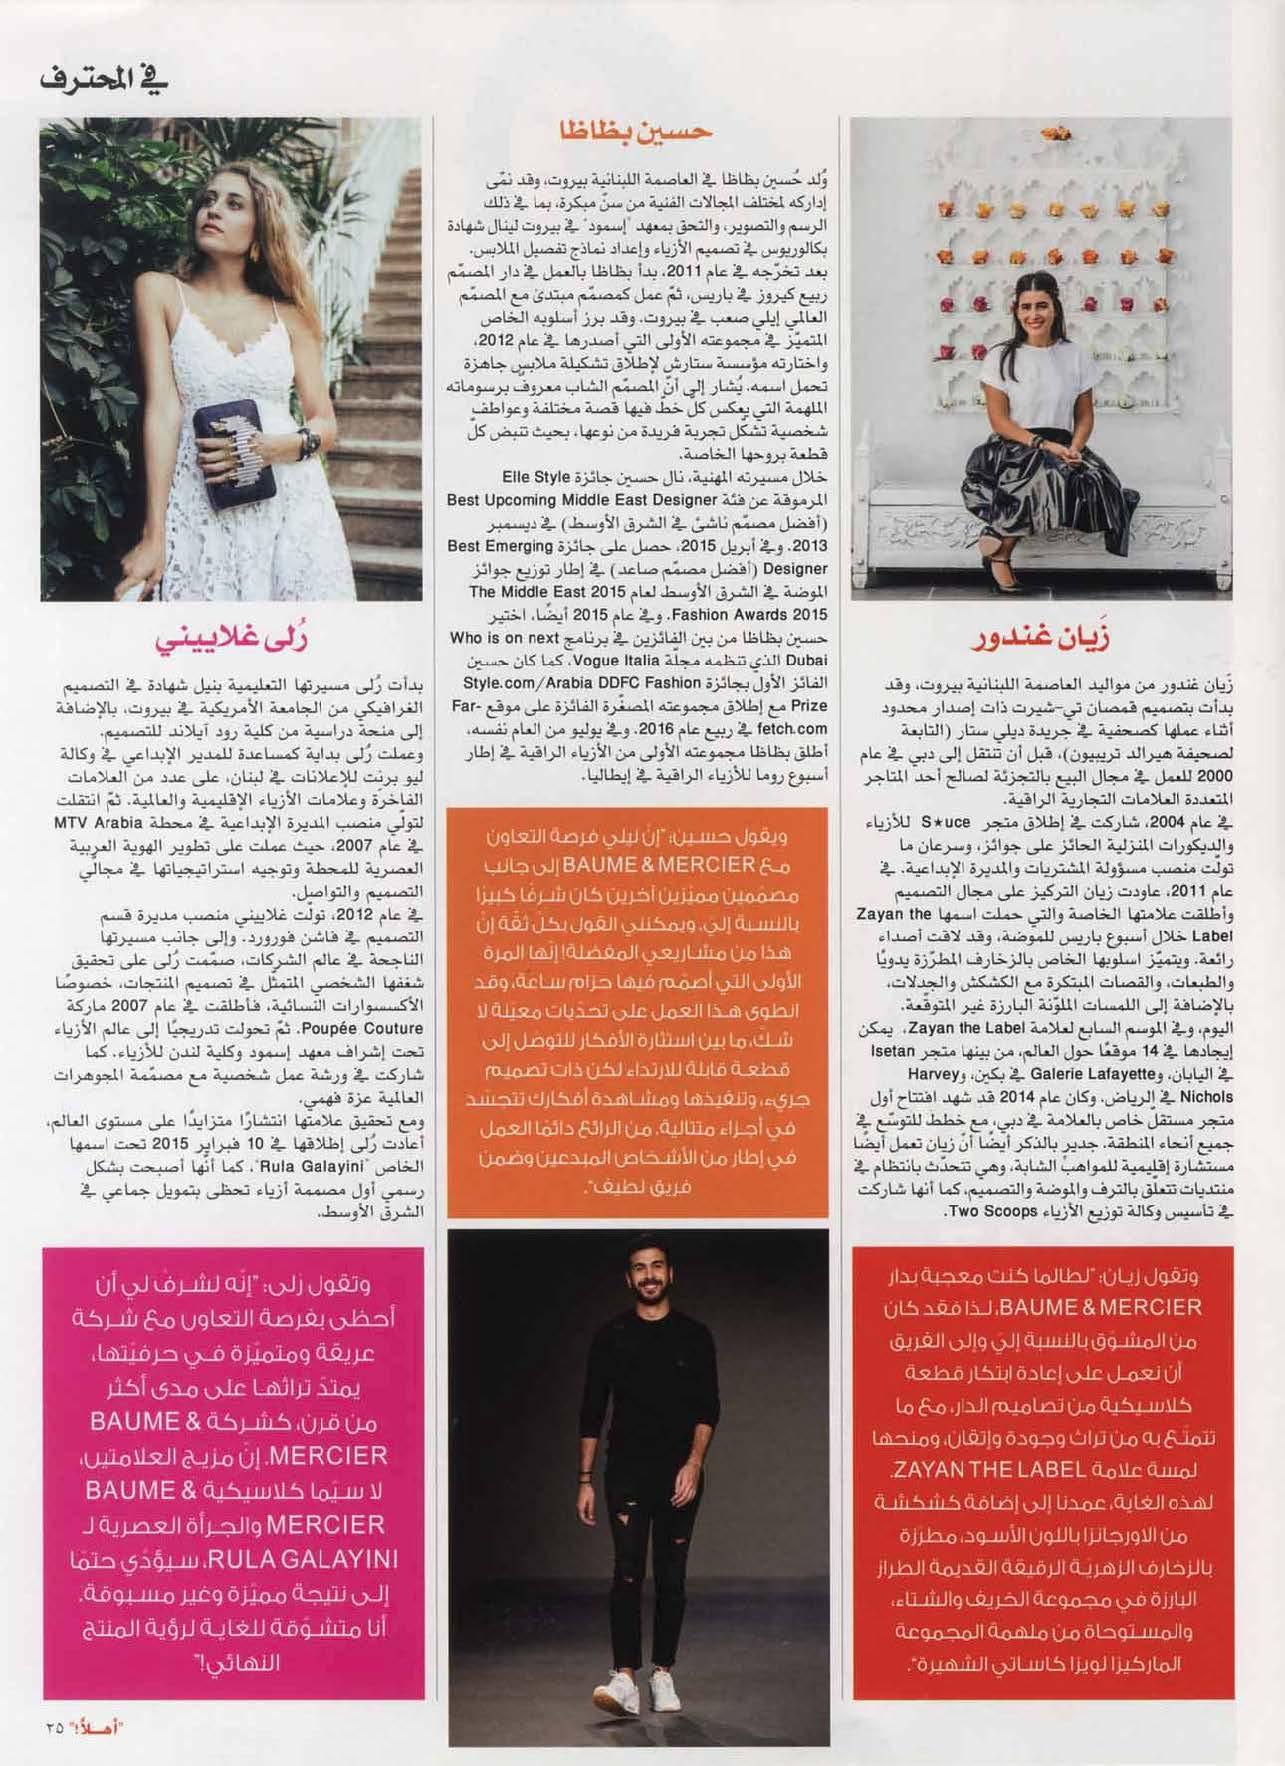 Ahlan! Arabia.Baume Mercier.5-11 Oct_Page_2.jpg